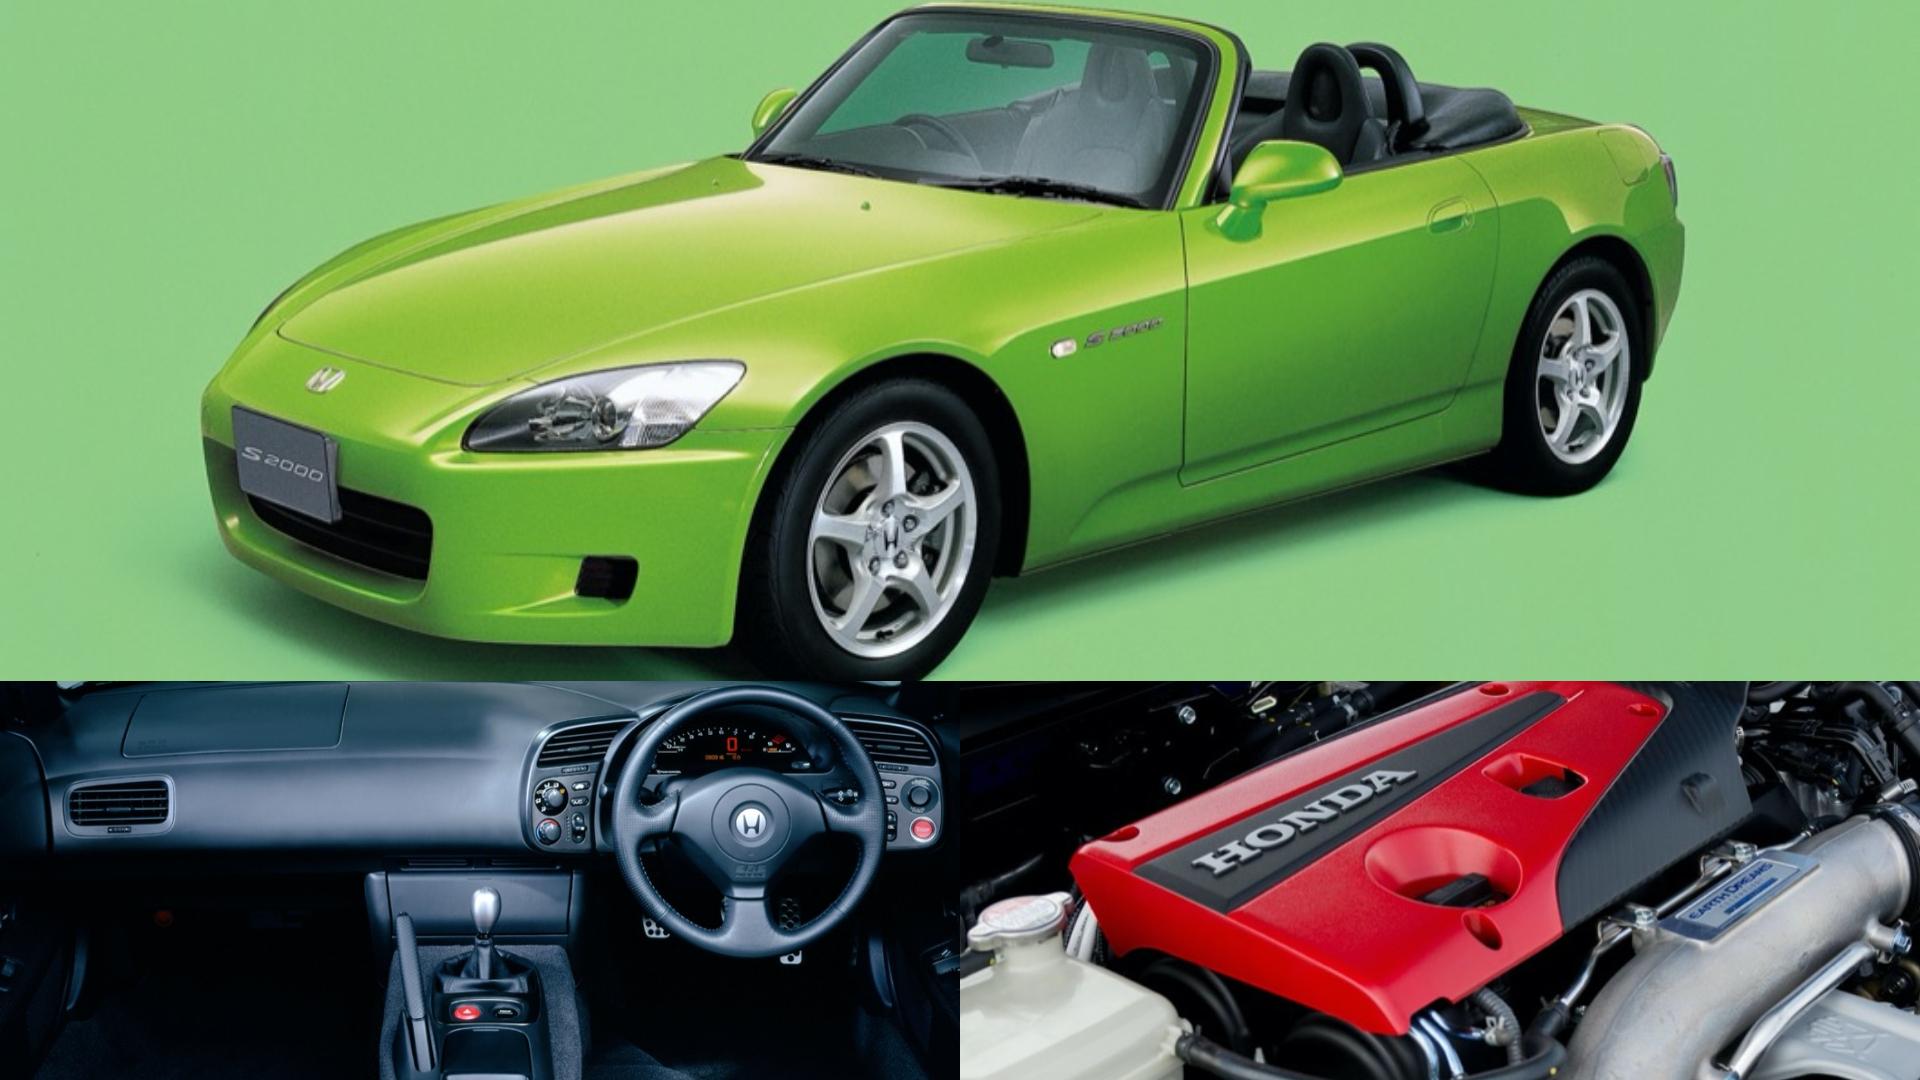 S2000是Honda旗下經典的雙座敞蓬跑車。(圖片來源/ Honda) Honda S2000復活有望? Type-R渦輪引擎蓄勢待發